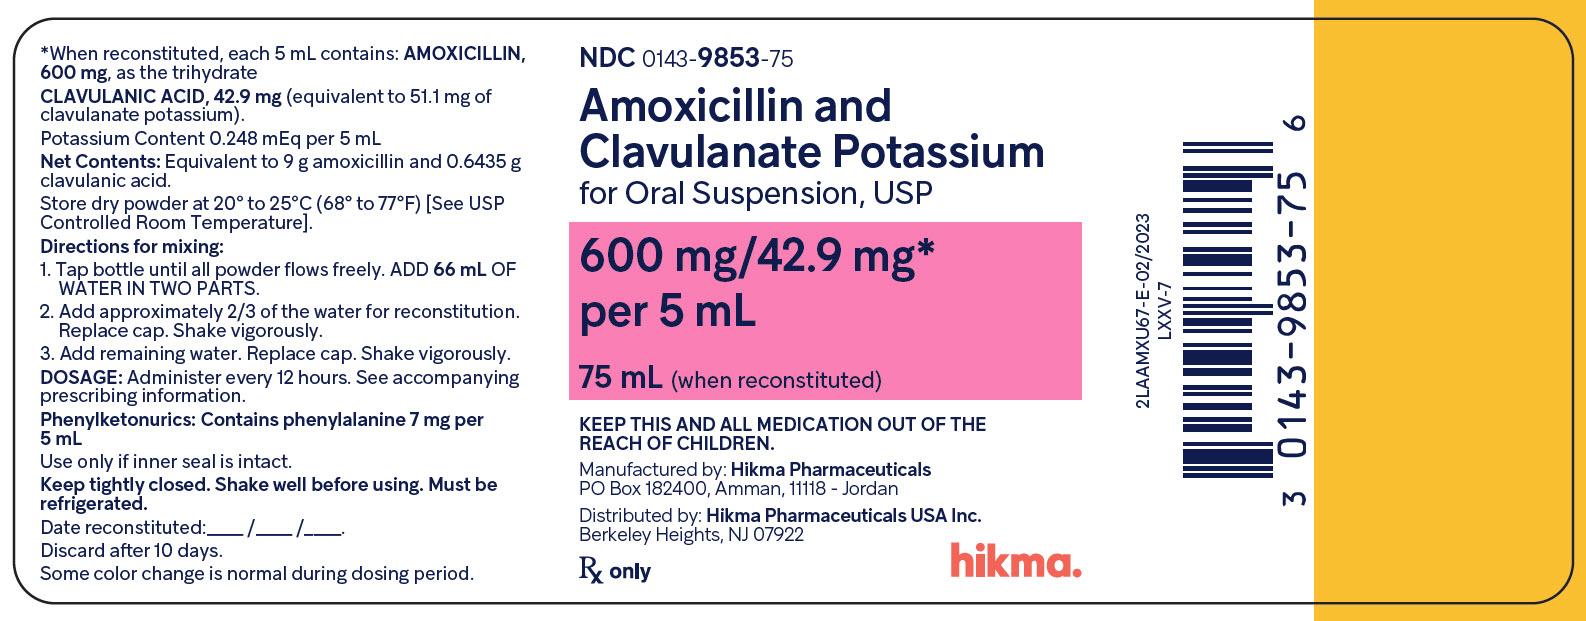 Amoxicillin And Clavulanate Potassium Suspension [West-ward Pharmaceutical Corp]